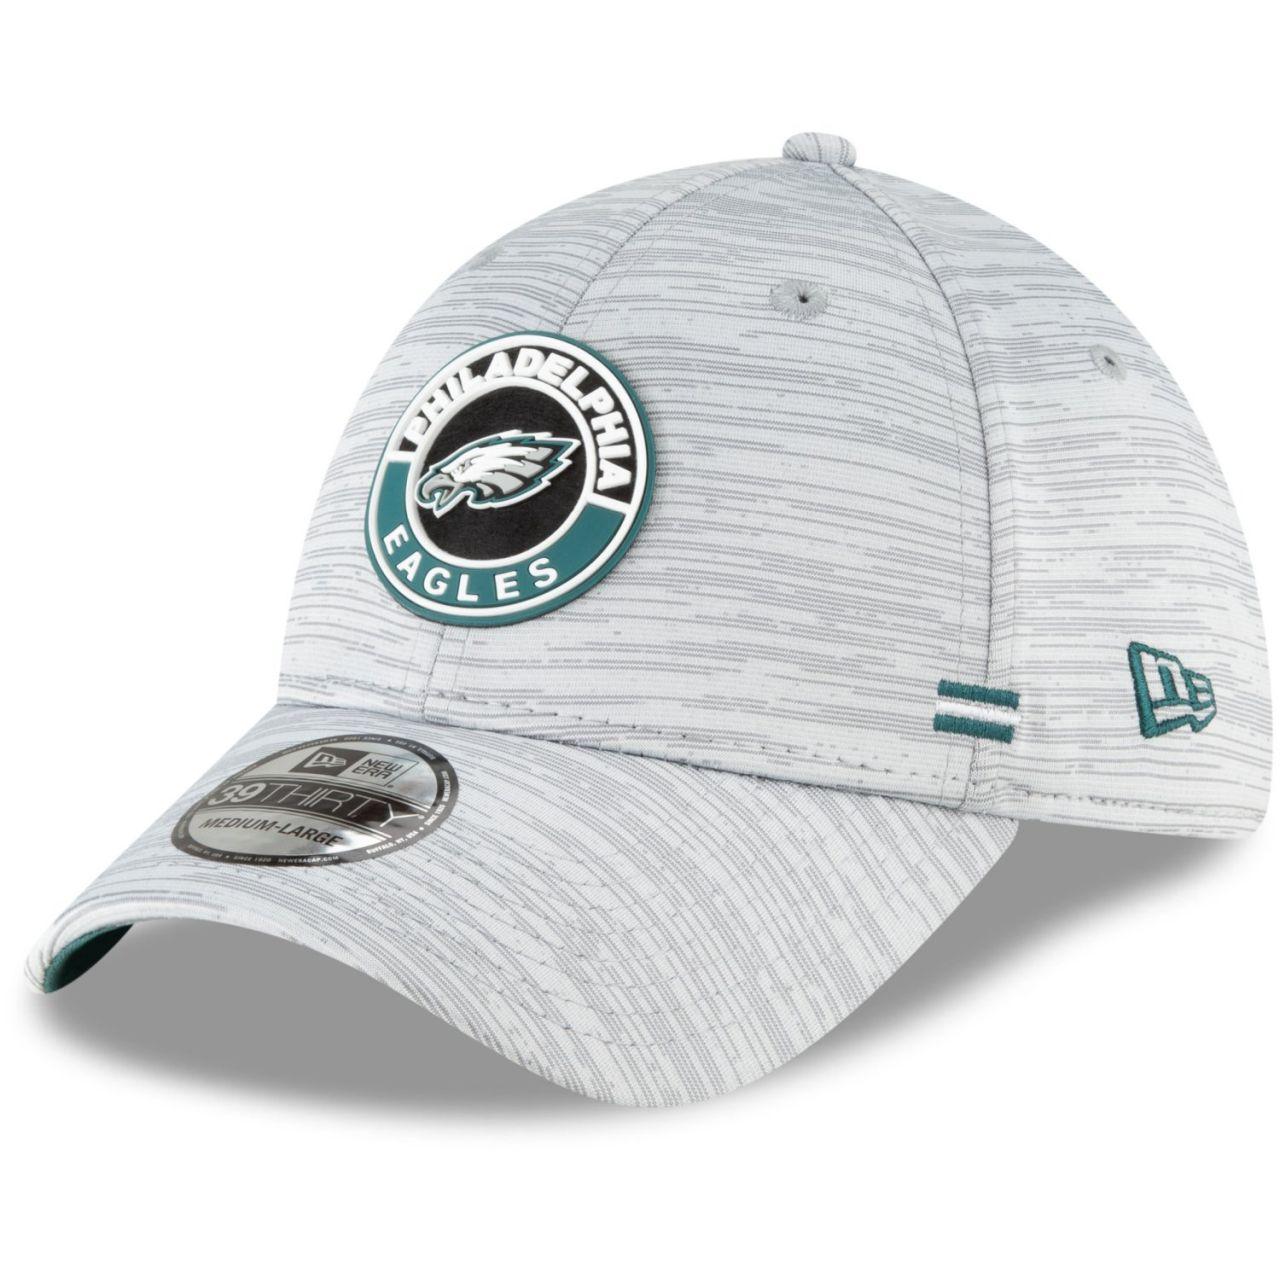 amfoo - New Era 39Thirty Cap - SIDELINE 2020 Philadelphia Eagles